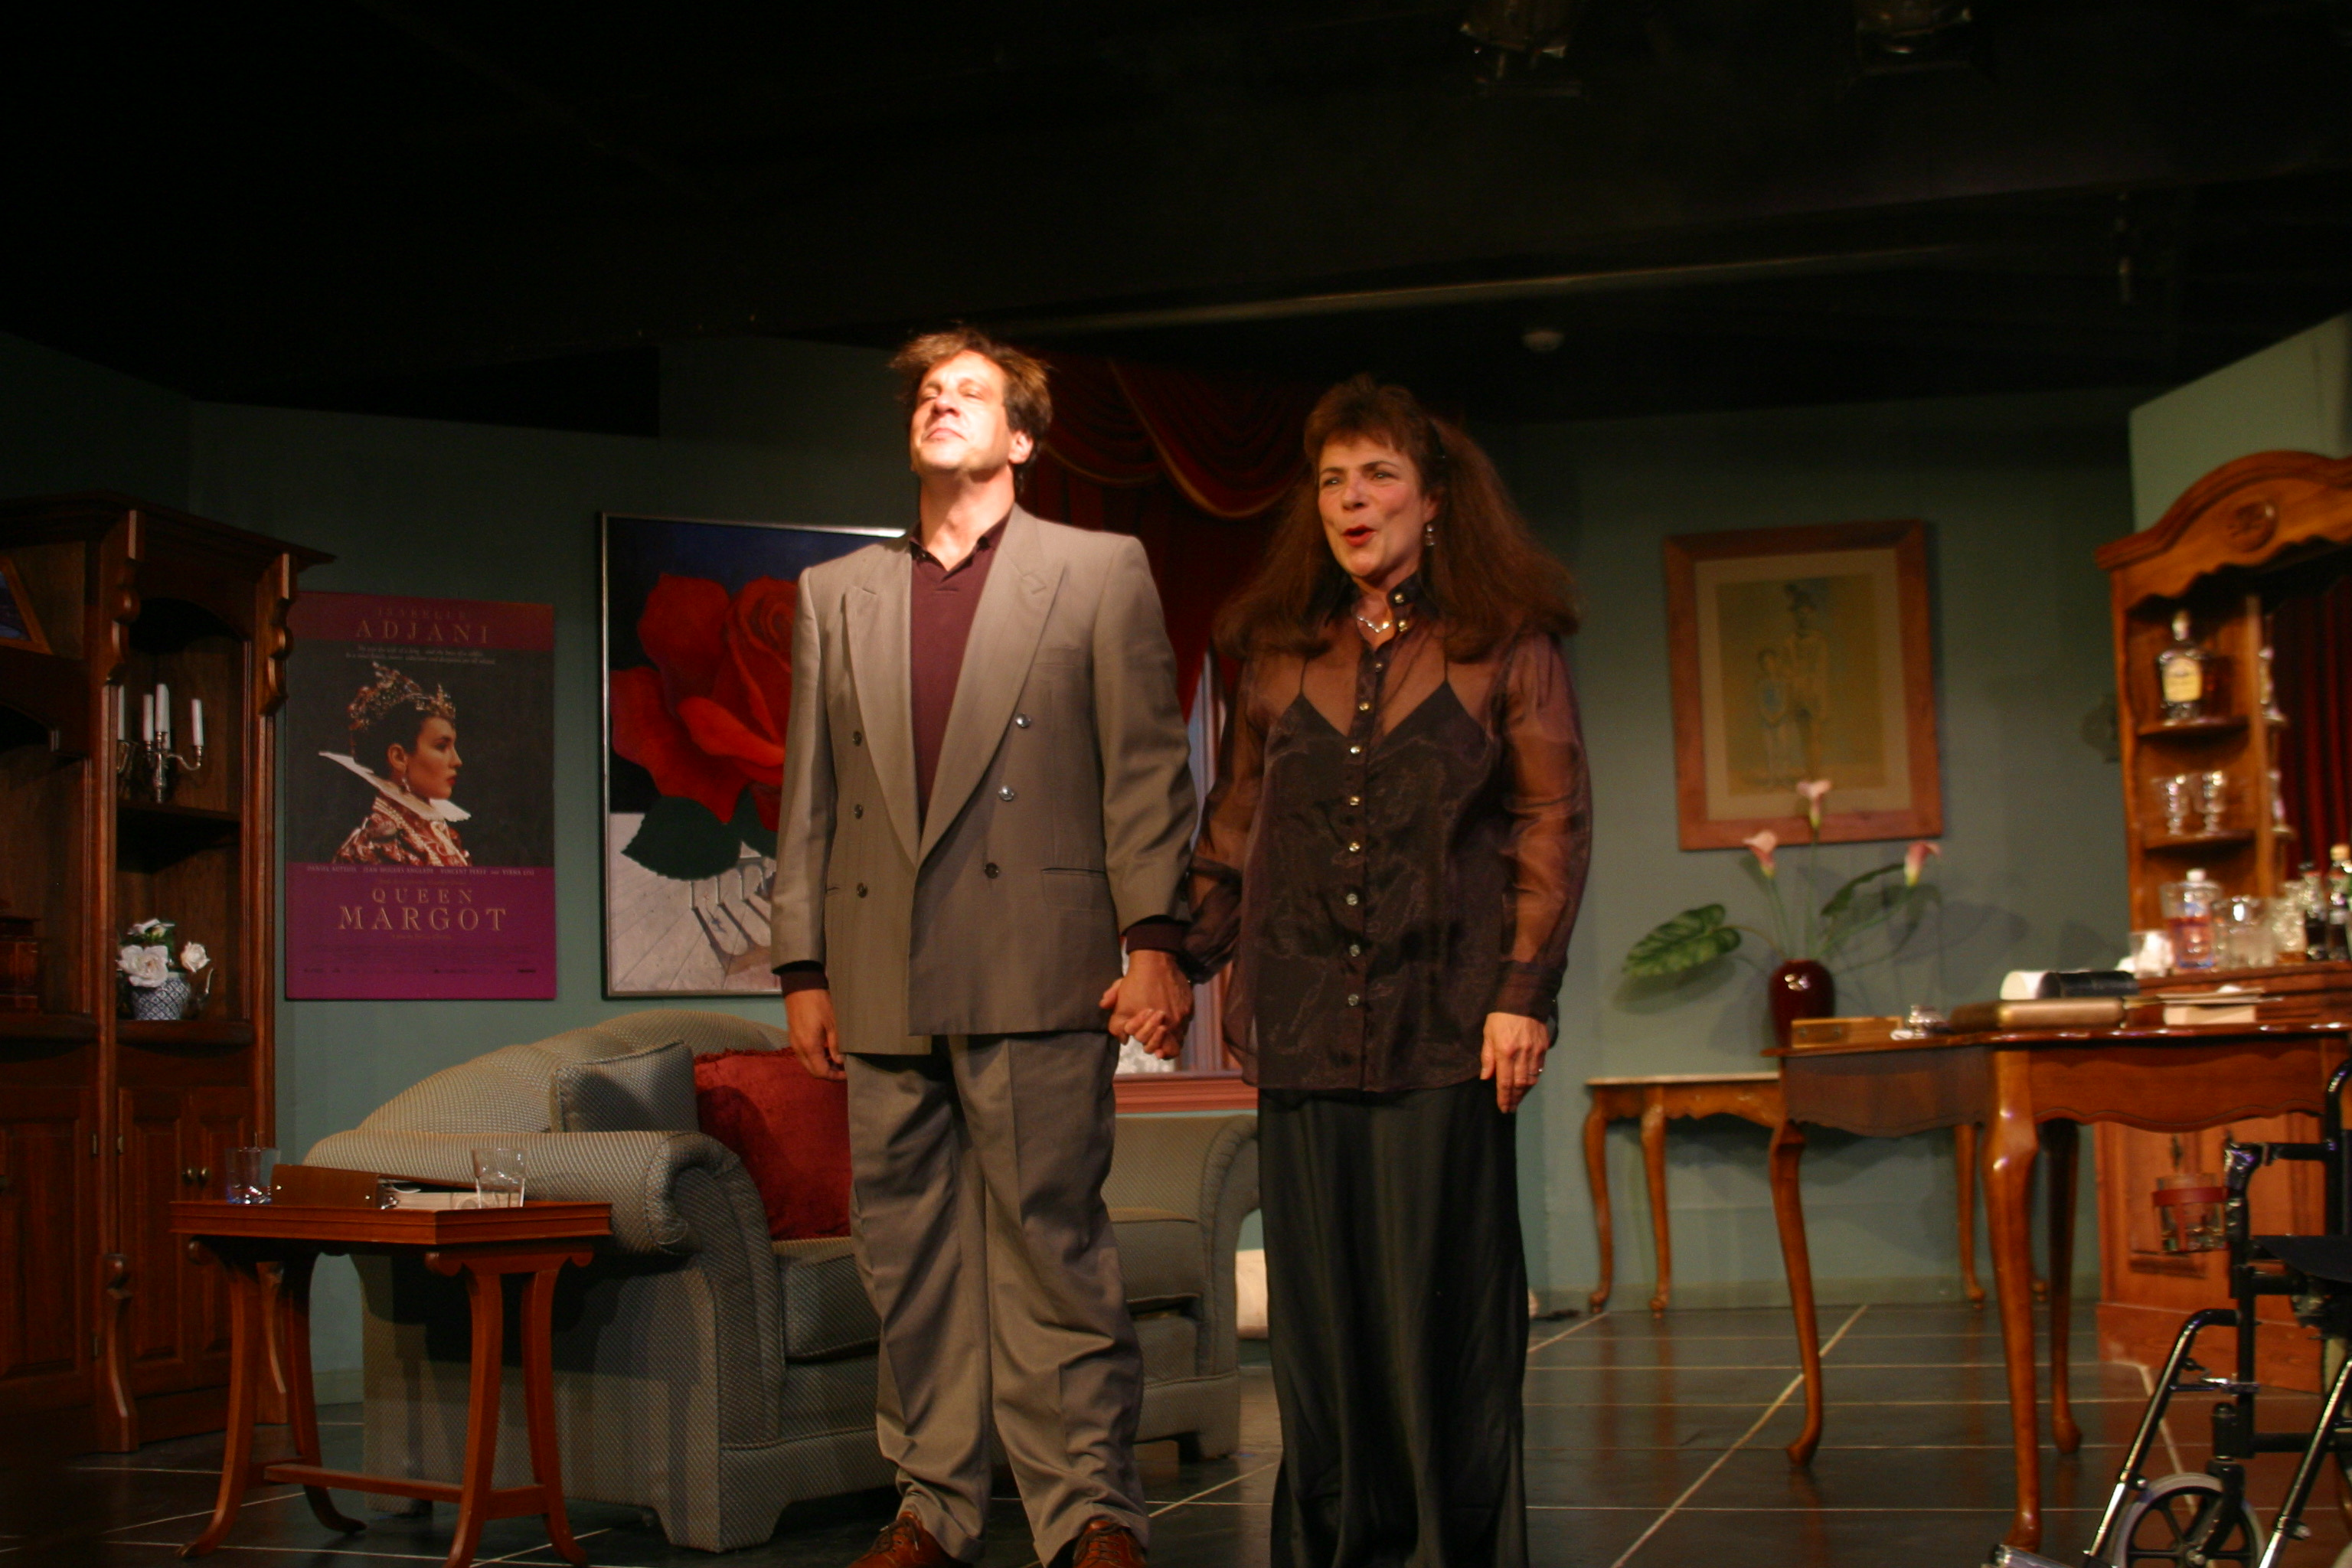 Carol Daly and James Brady